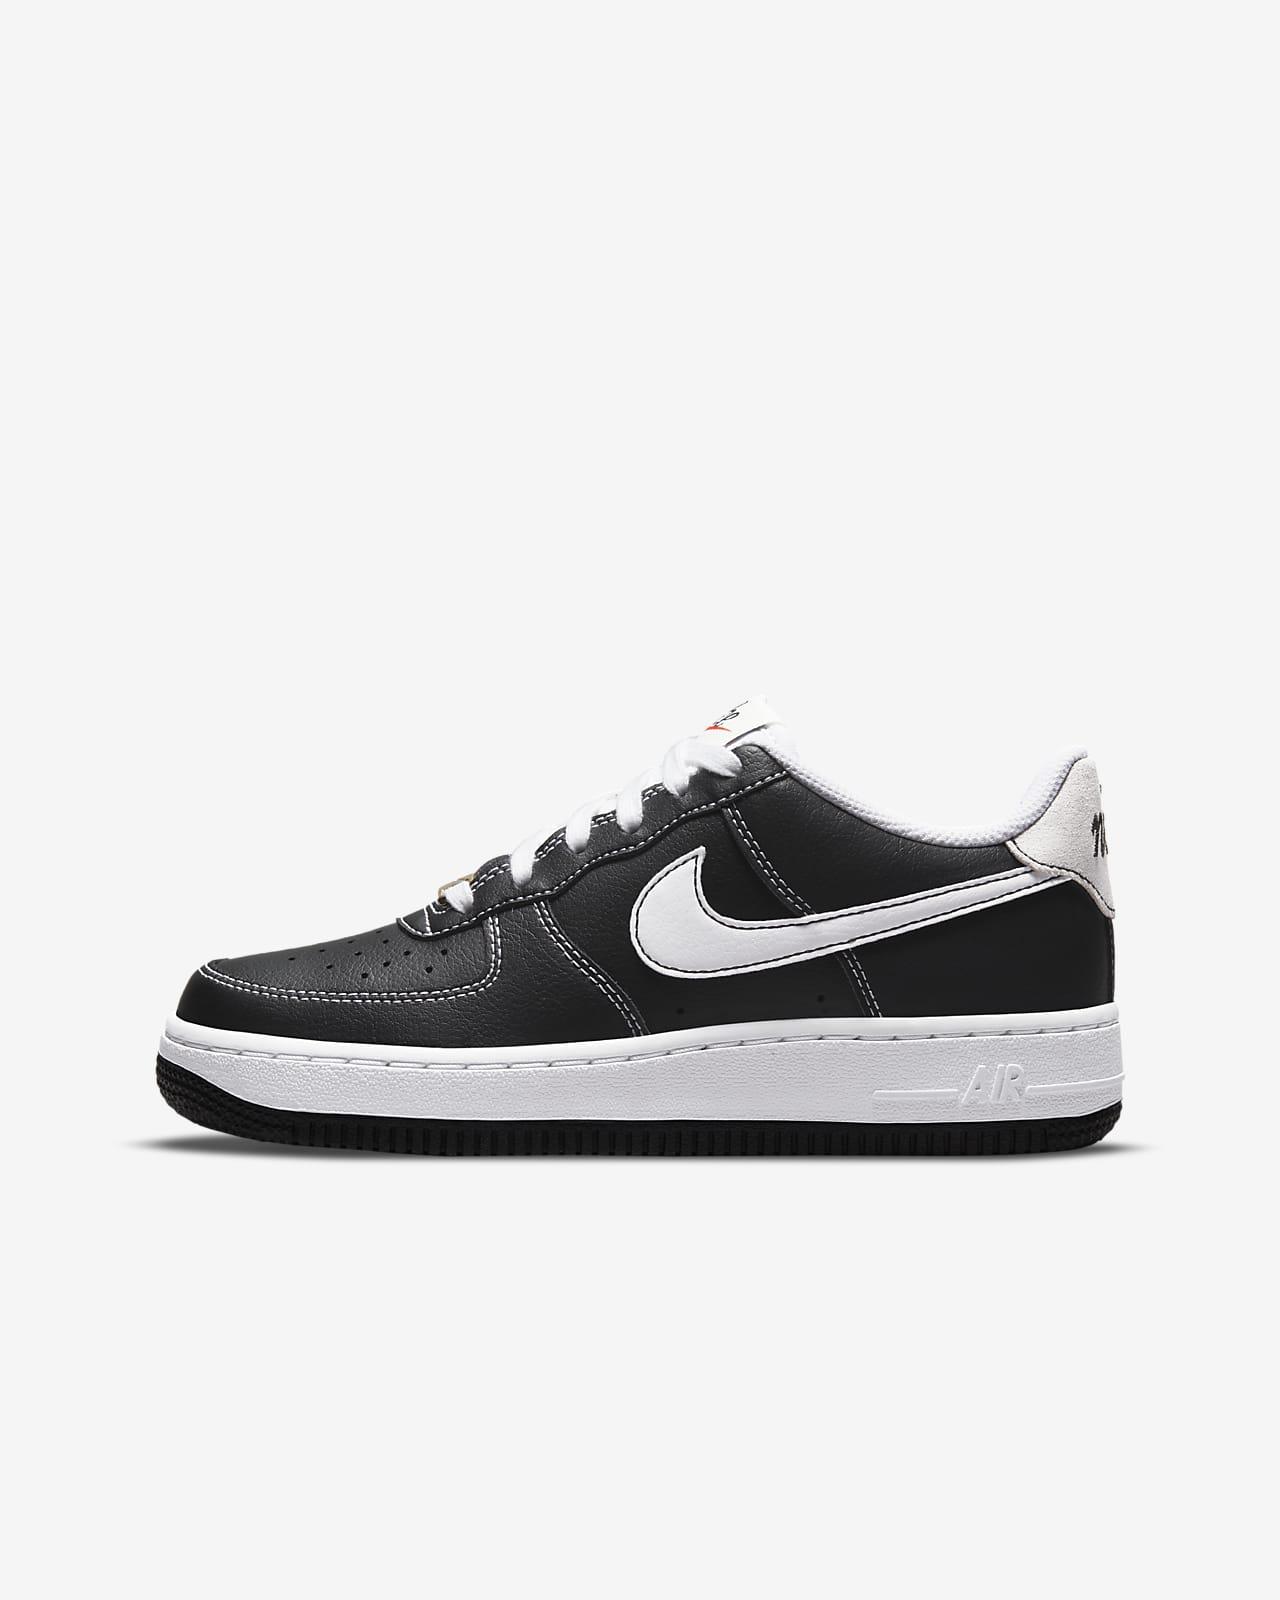 Nike Air Force 1 S50 Big Kids' Shoes